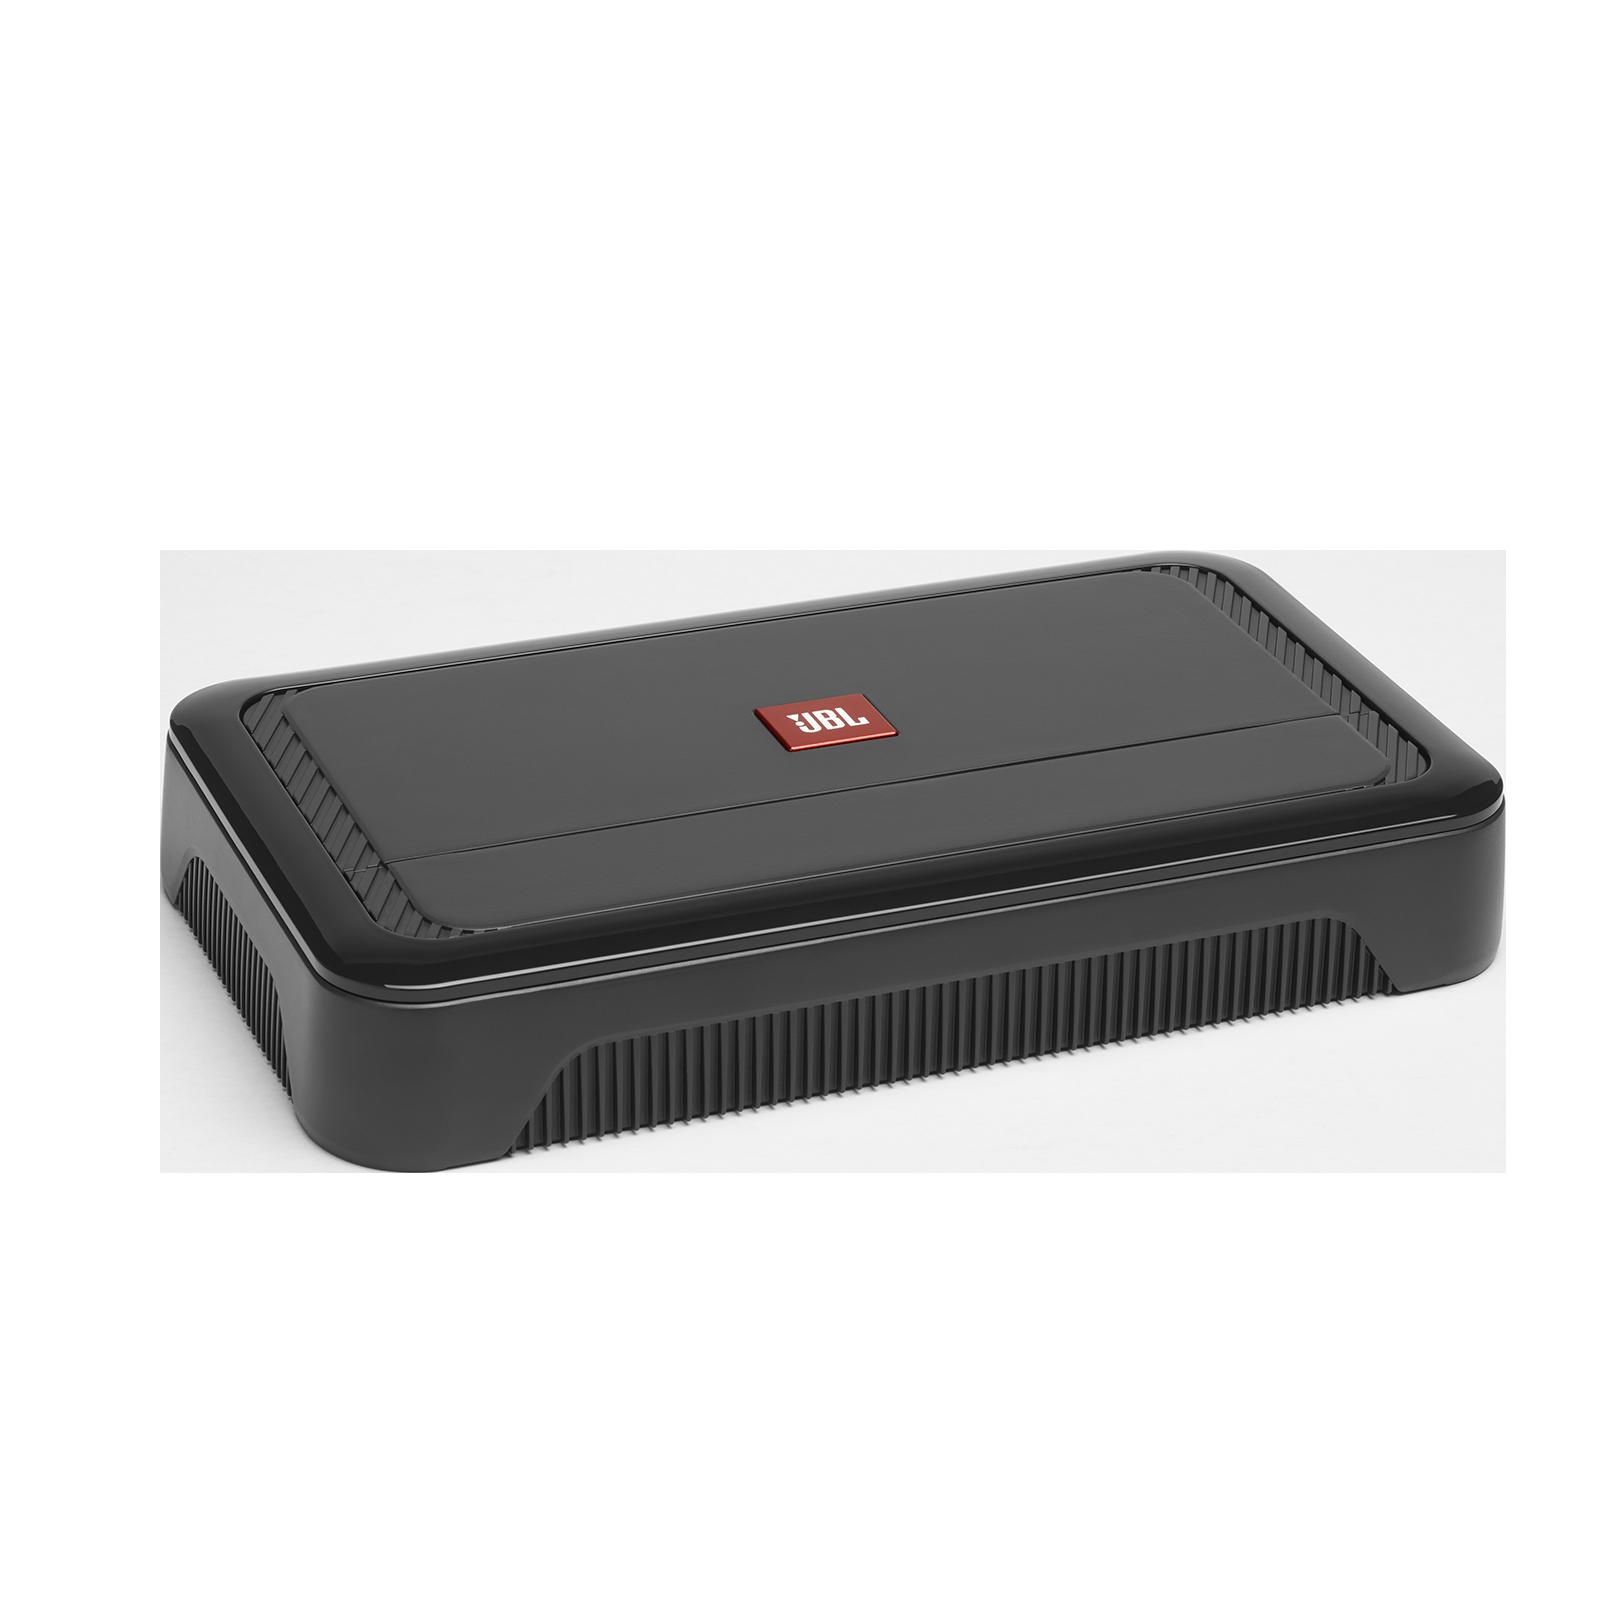 Club A754 - Black - High performance 4 channel car amplifier - Hero